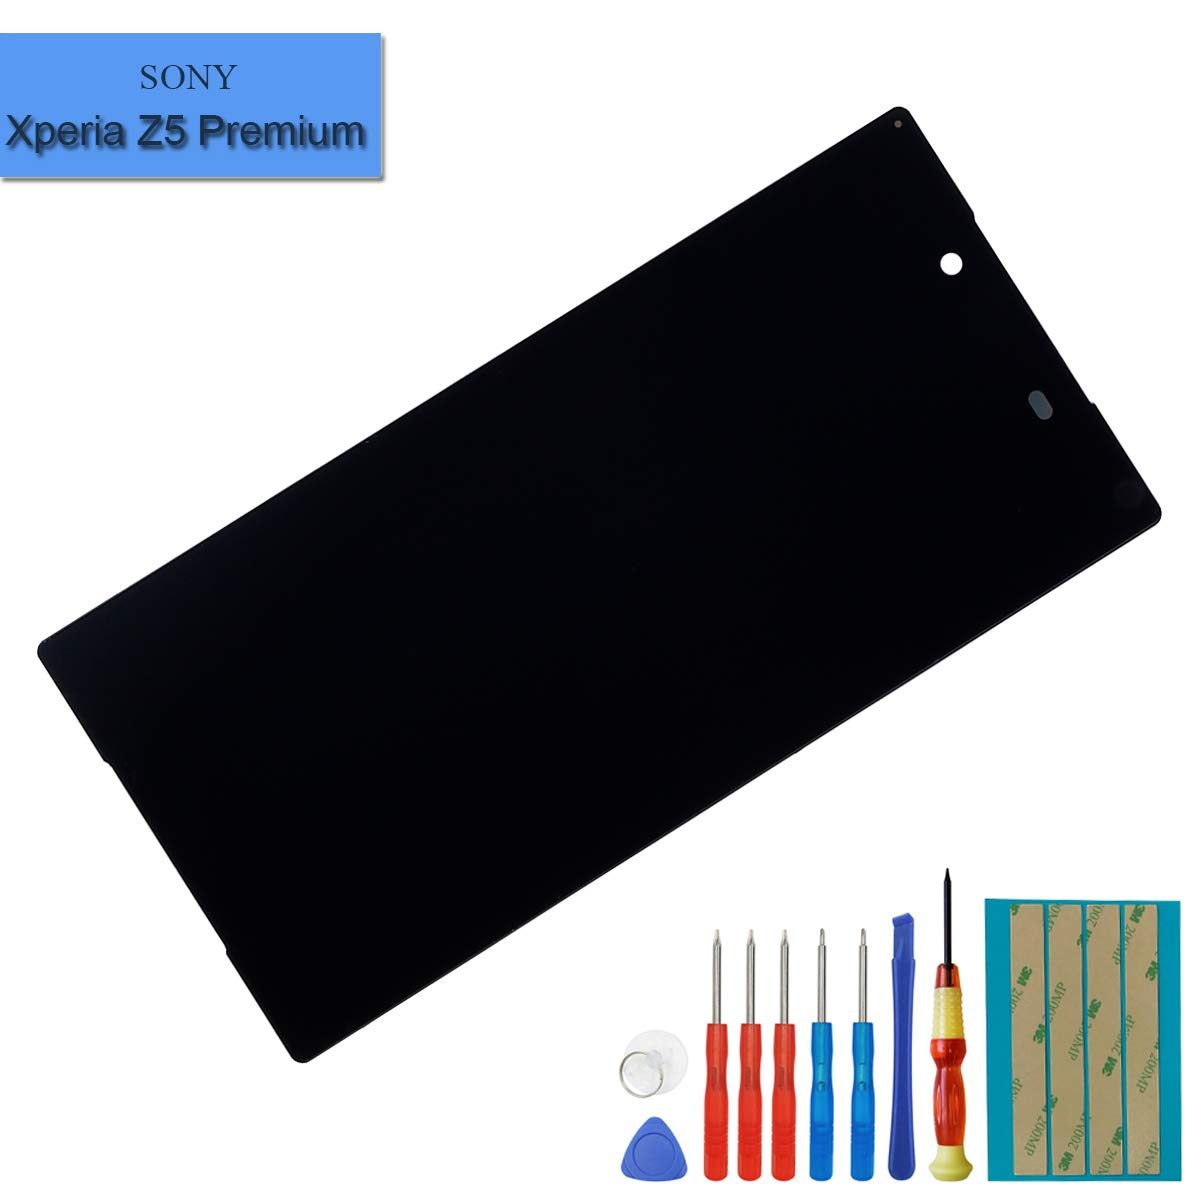 Repuesto lcd pantalla tactil para Sony Xperia Z5 Premium